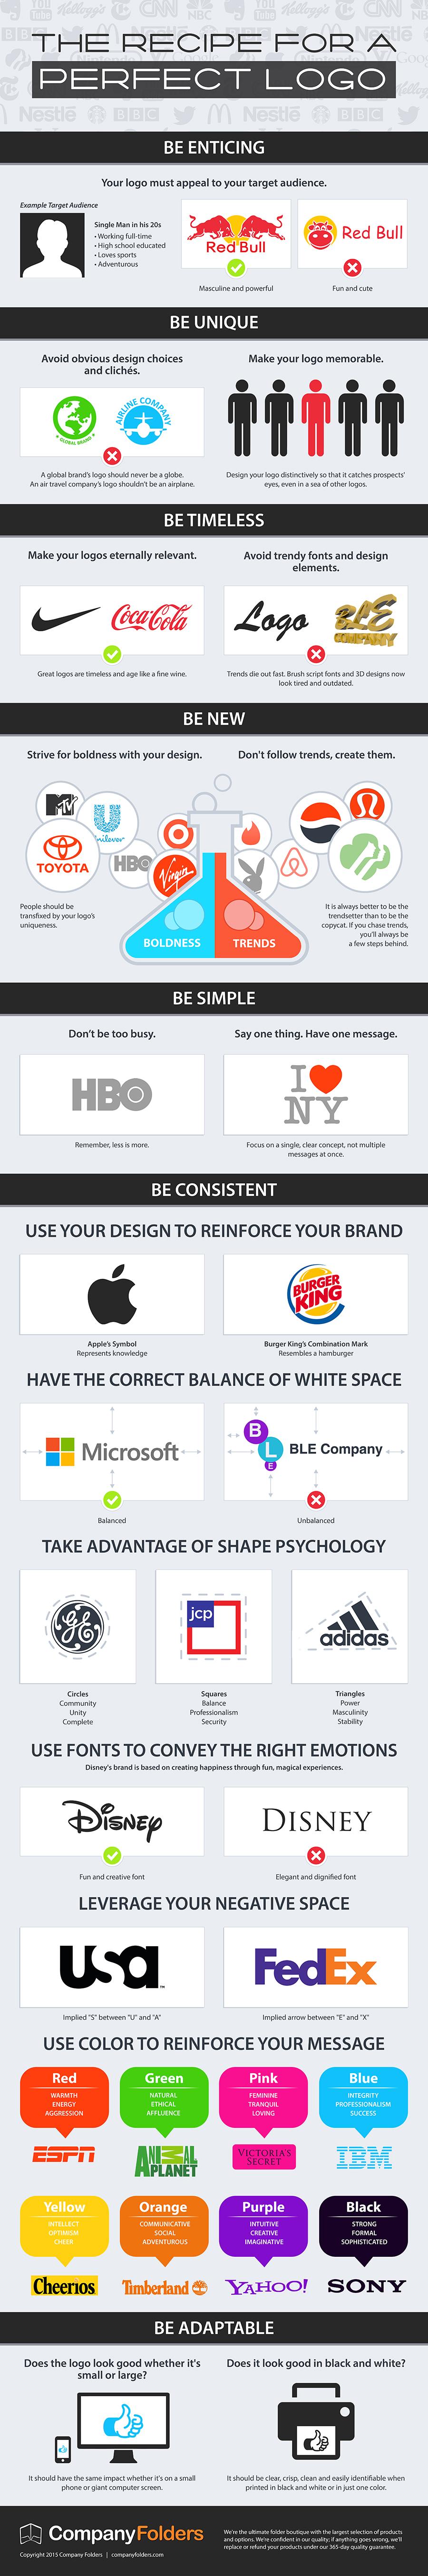 perfect-logo-design-infographic